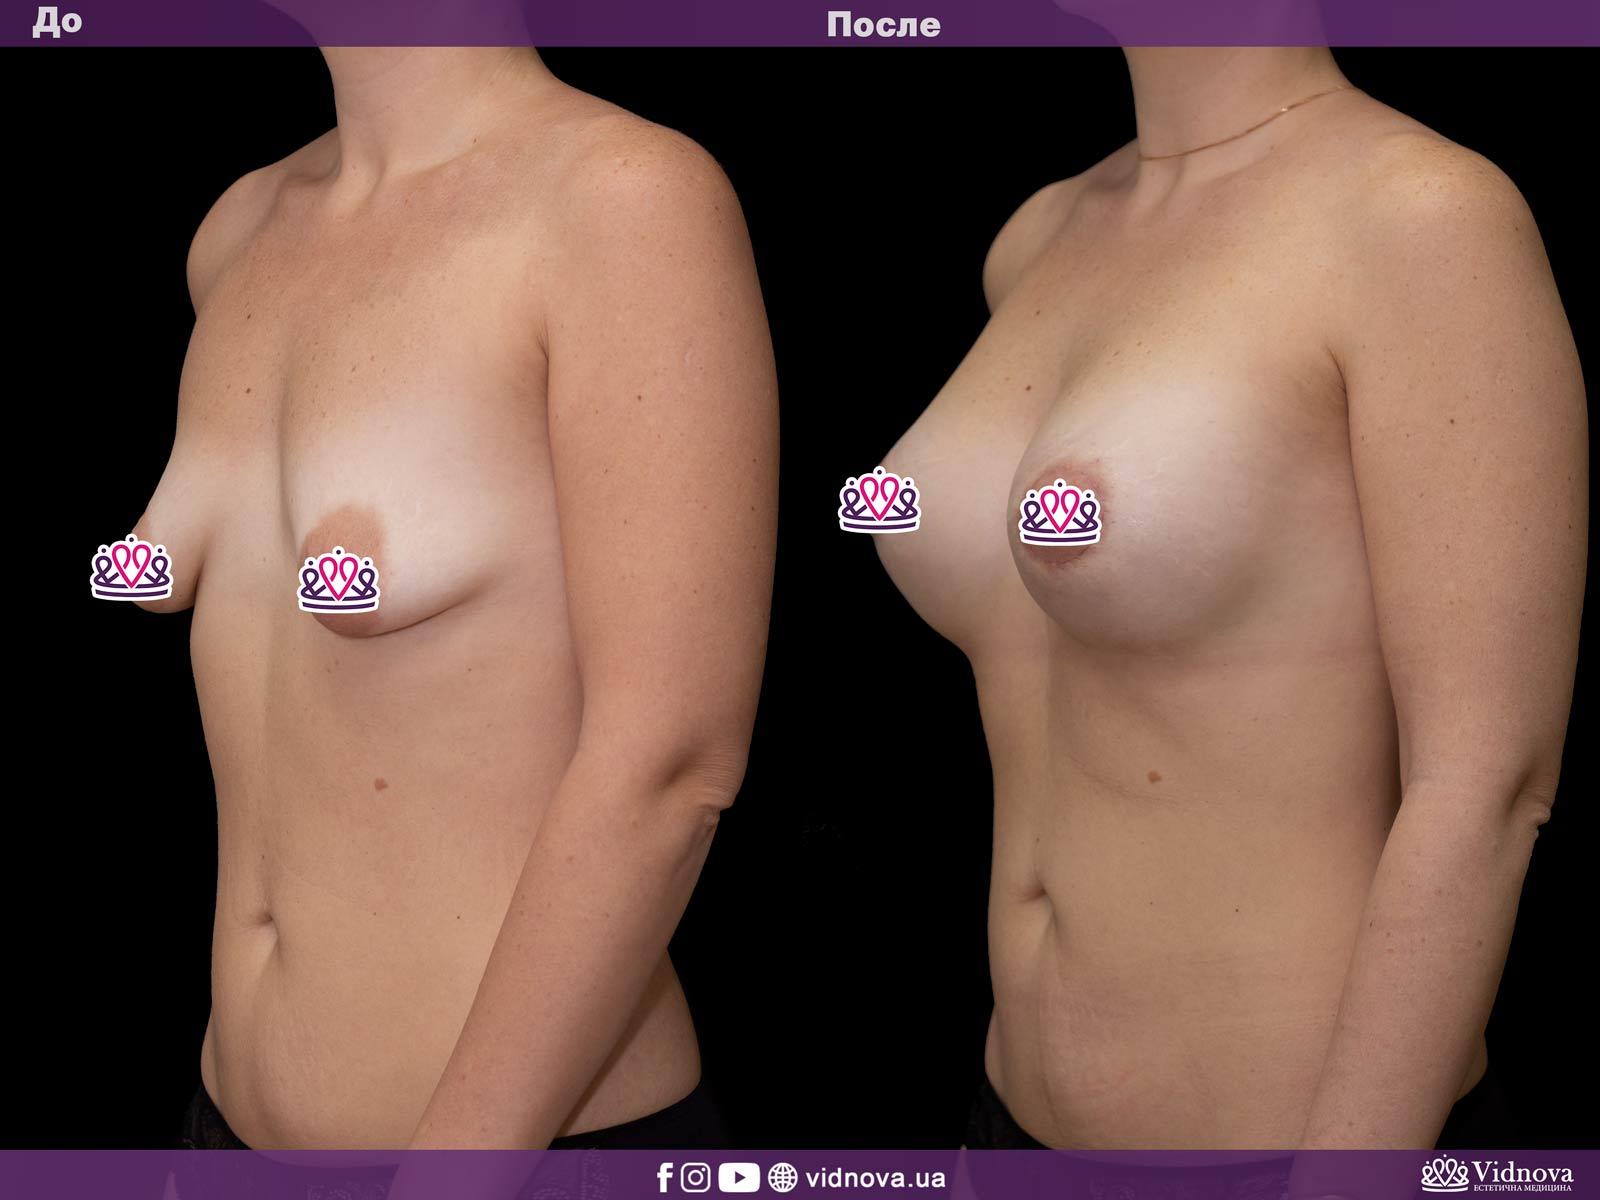 Подтяжка груди: Фото ДО и ПОСЛЕ - Пример №17-2 - Клиника Vidnova